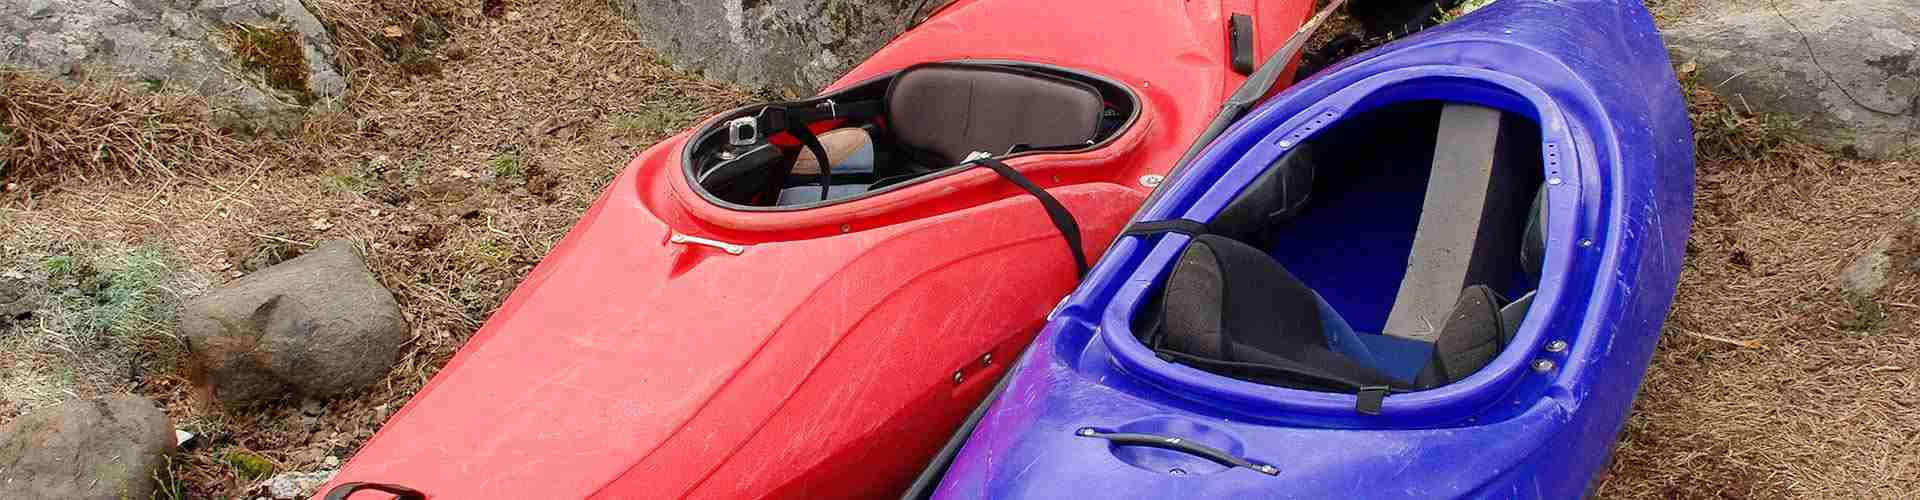 alquiler de kayaks en centrosdeportes de Bilbao